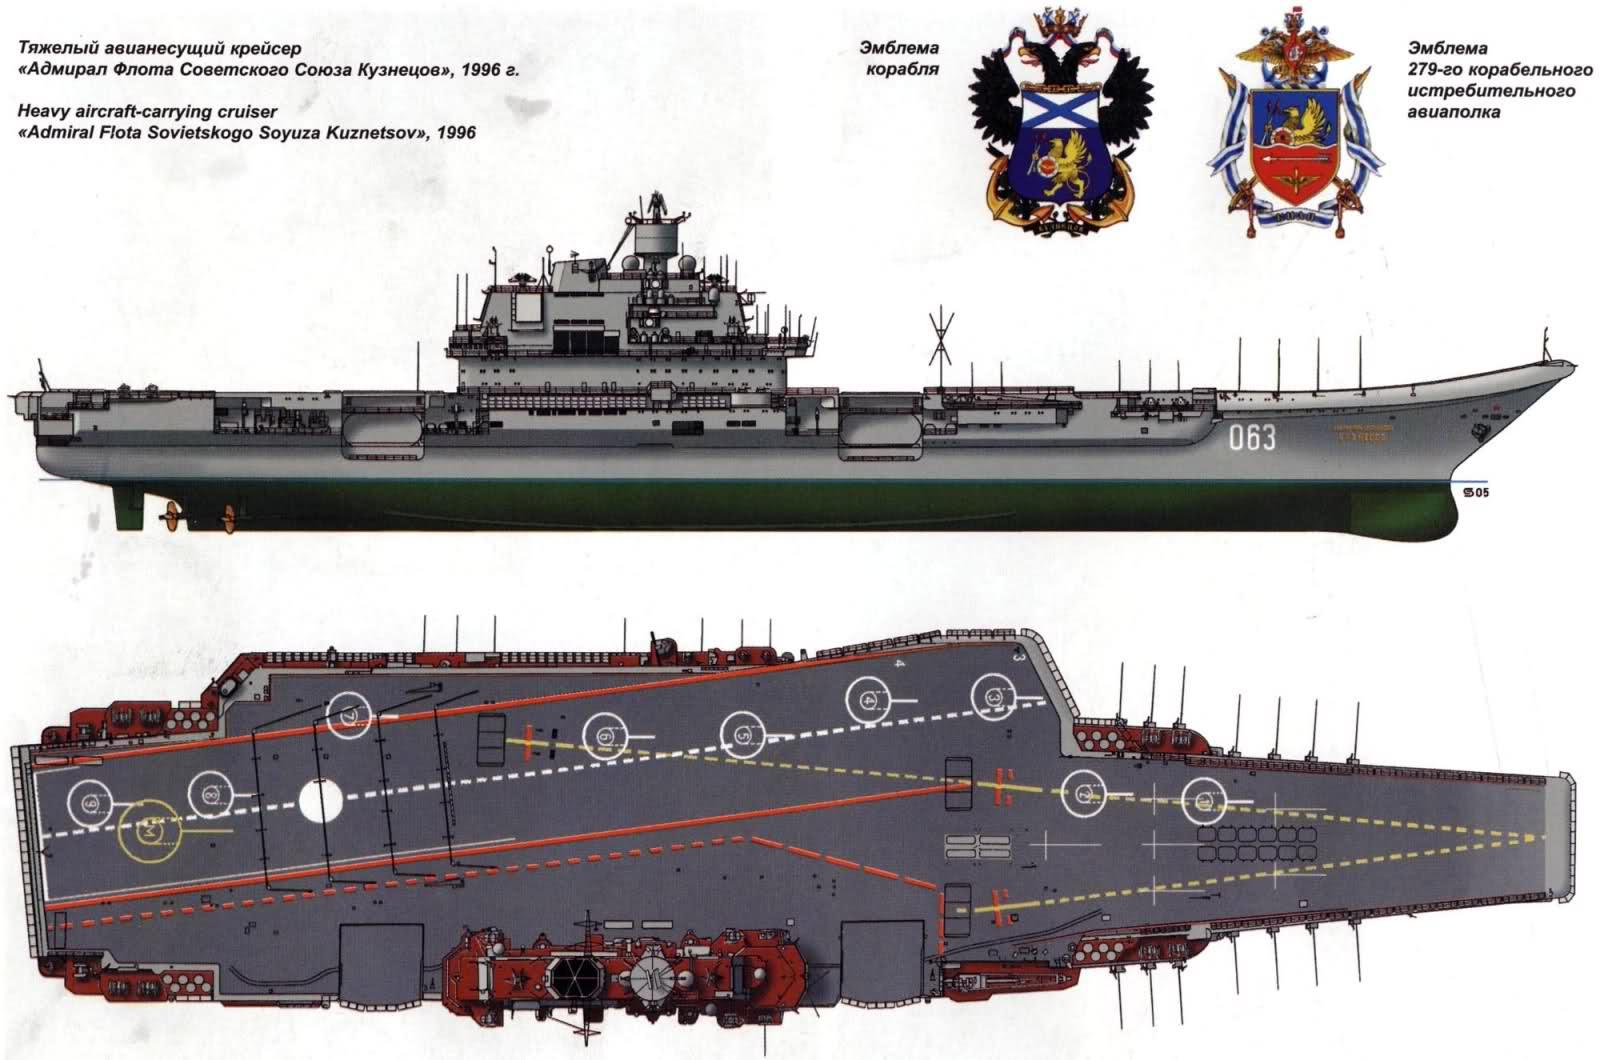 Fuerzas Armadas de Rusia  Portaaviones-kuznetstov